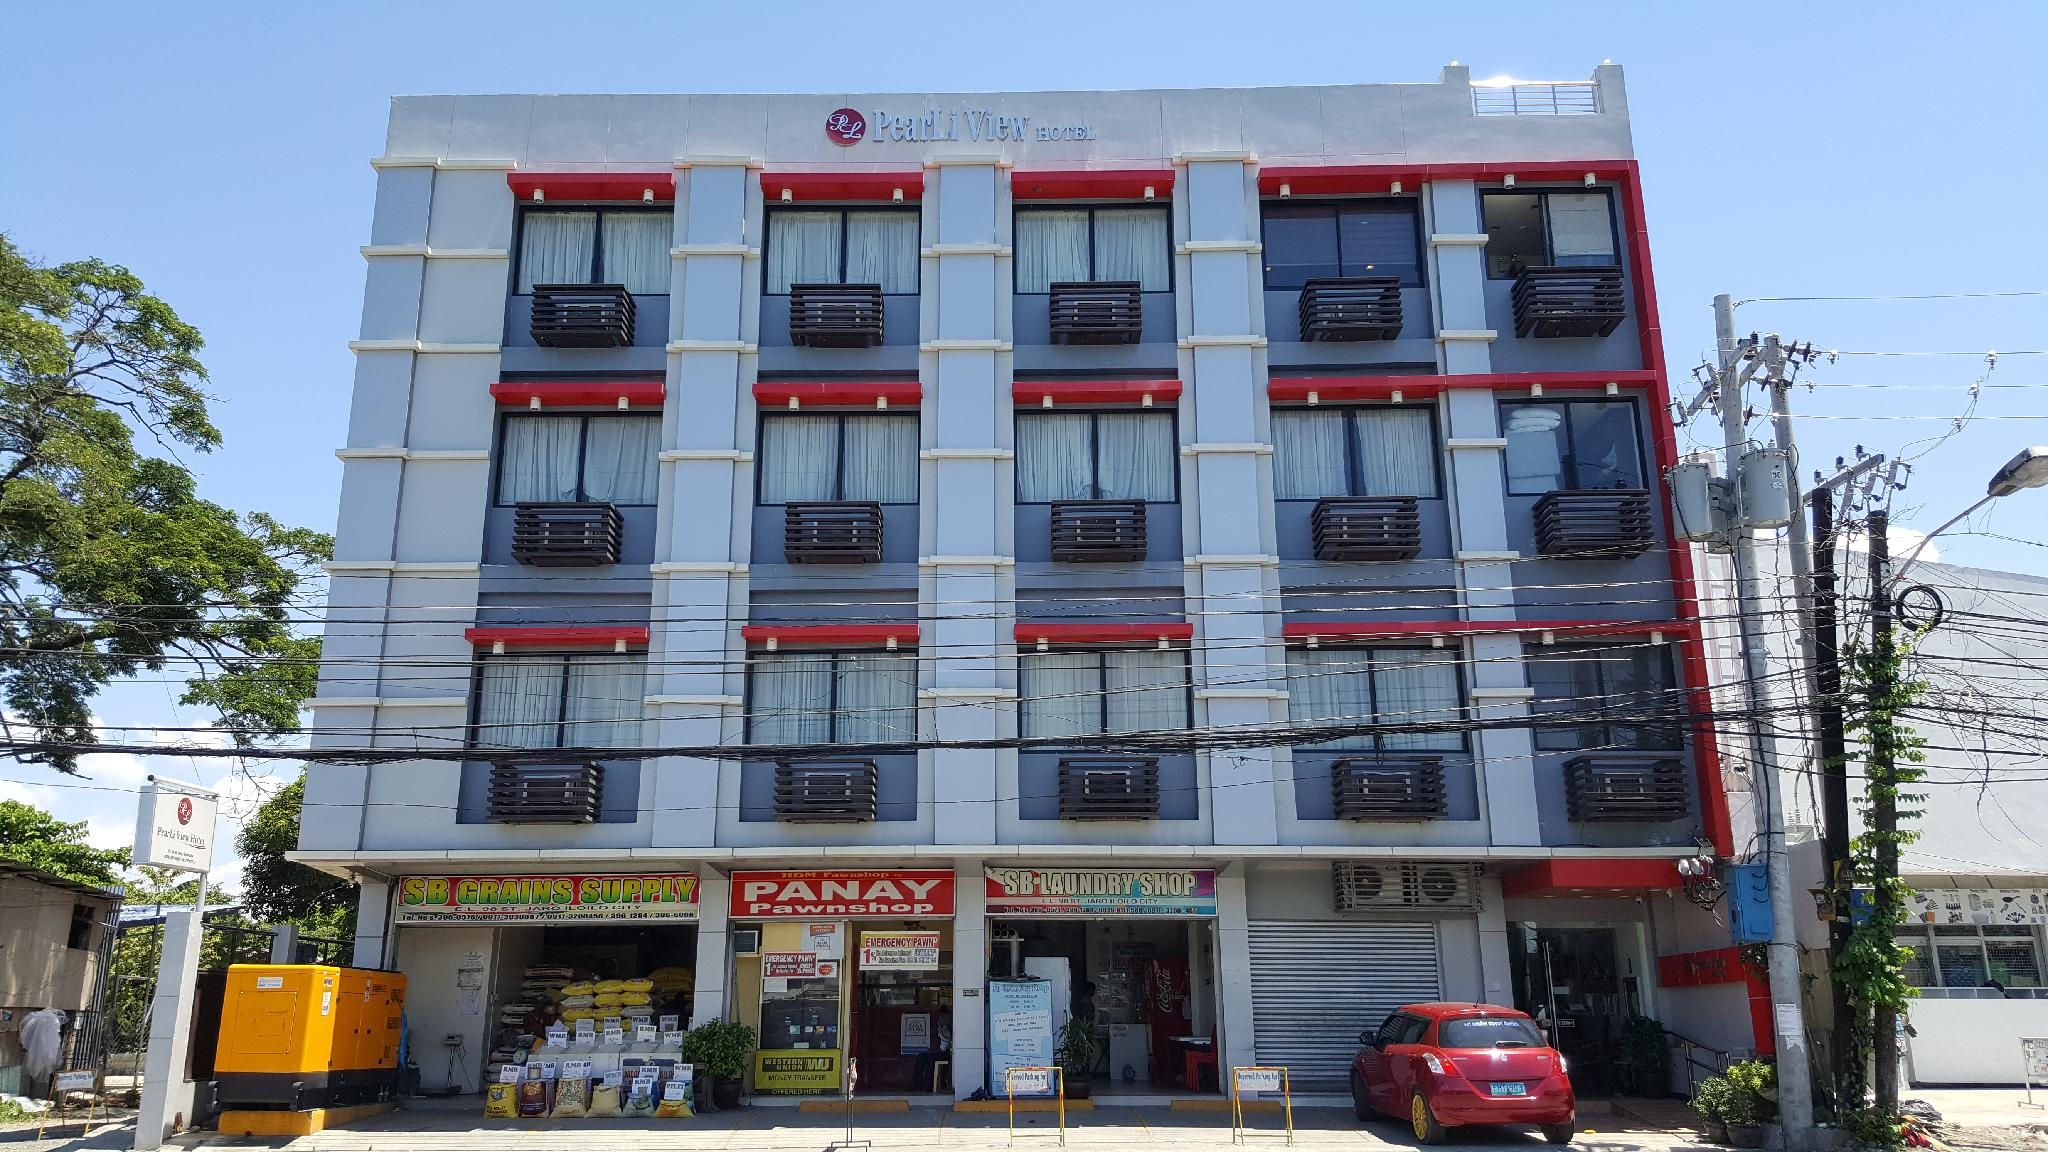 Pearli View Hotel